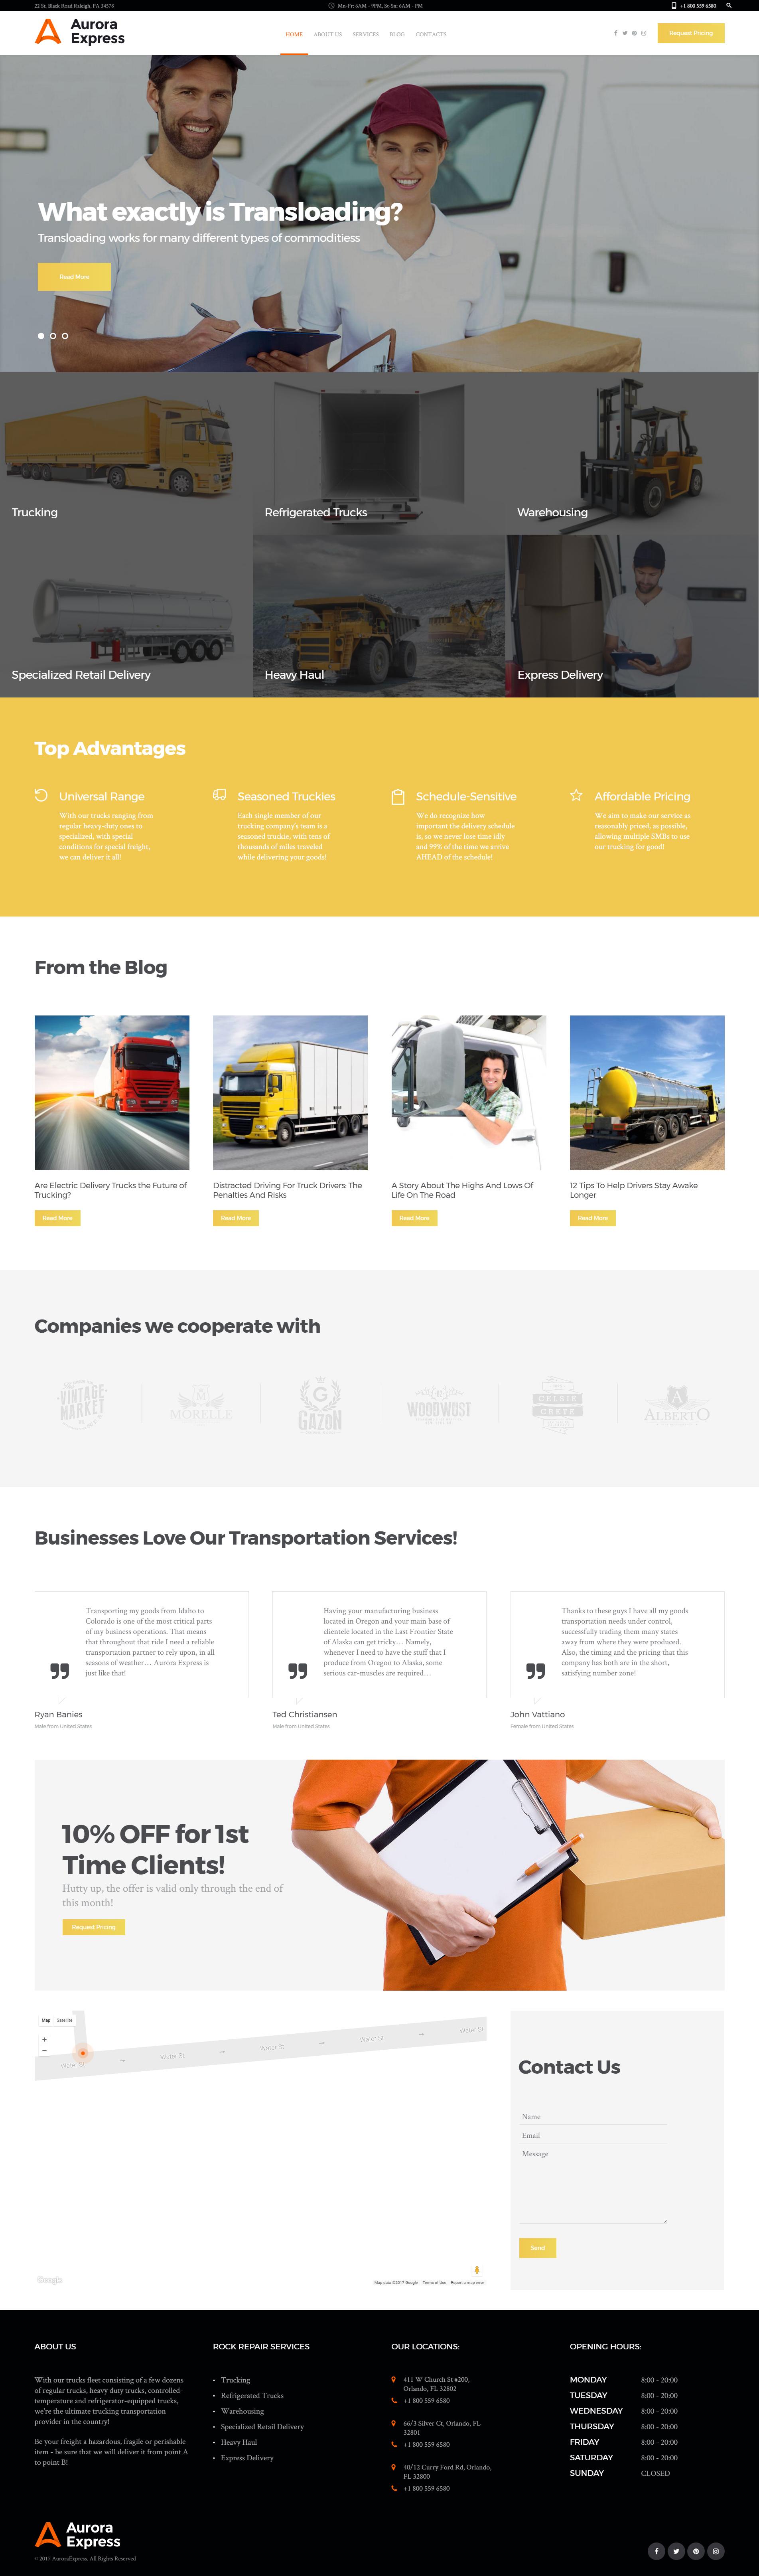 Responsive AuroraExpress - Transportation Company Responsive Wordpress #60107